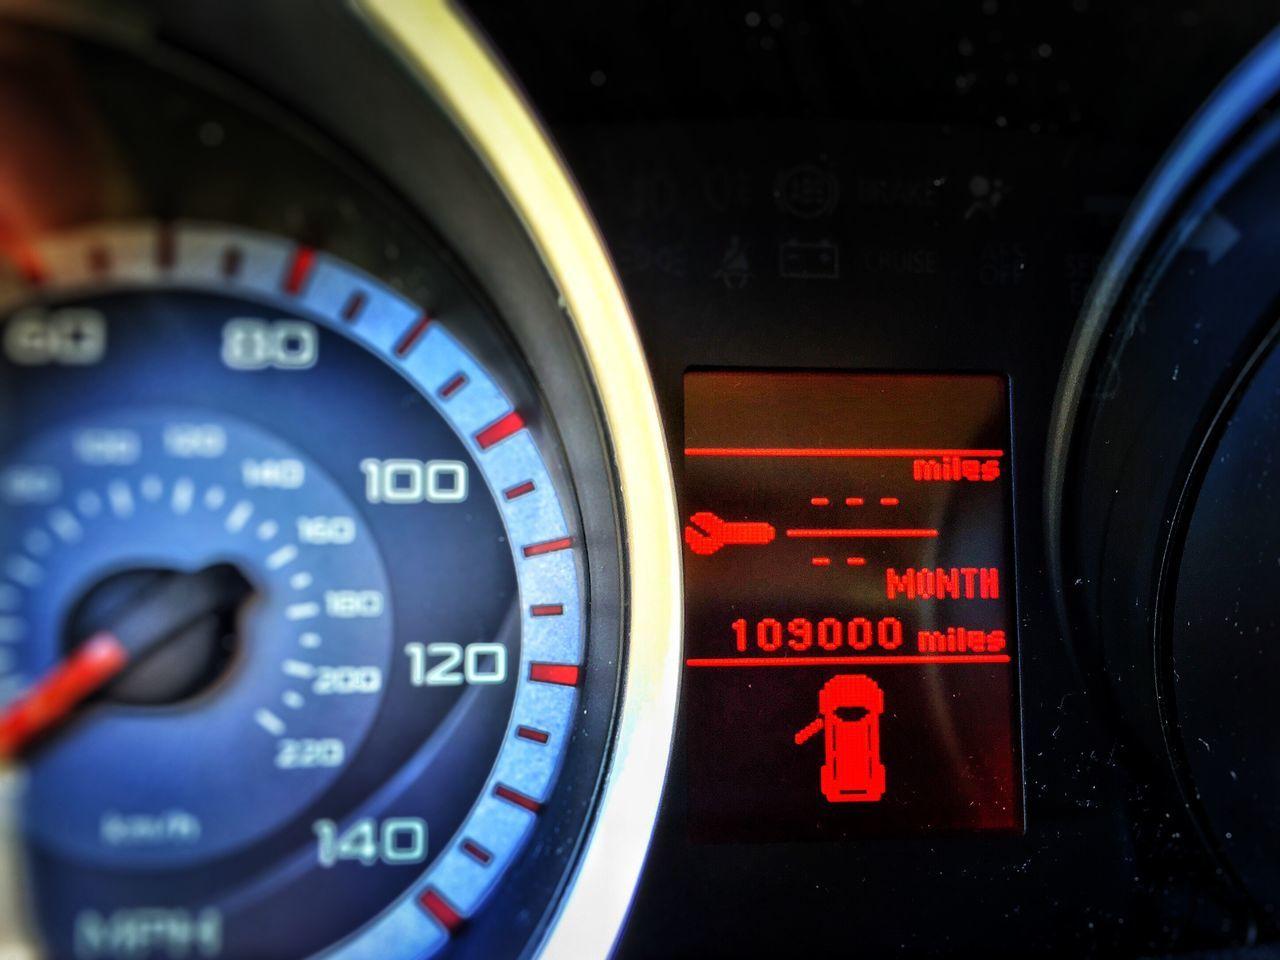 Number Speedometer Dashboard Meter - Instrument Of Measurement Gauge Transportation Car Land Vehicle Close-up Vehicle Interior Mode Of Transport Car Interior No People Speed Illuminated Technology Steering Wheel Control Panel